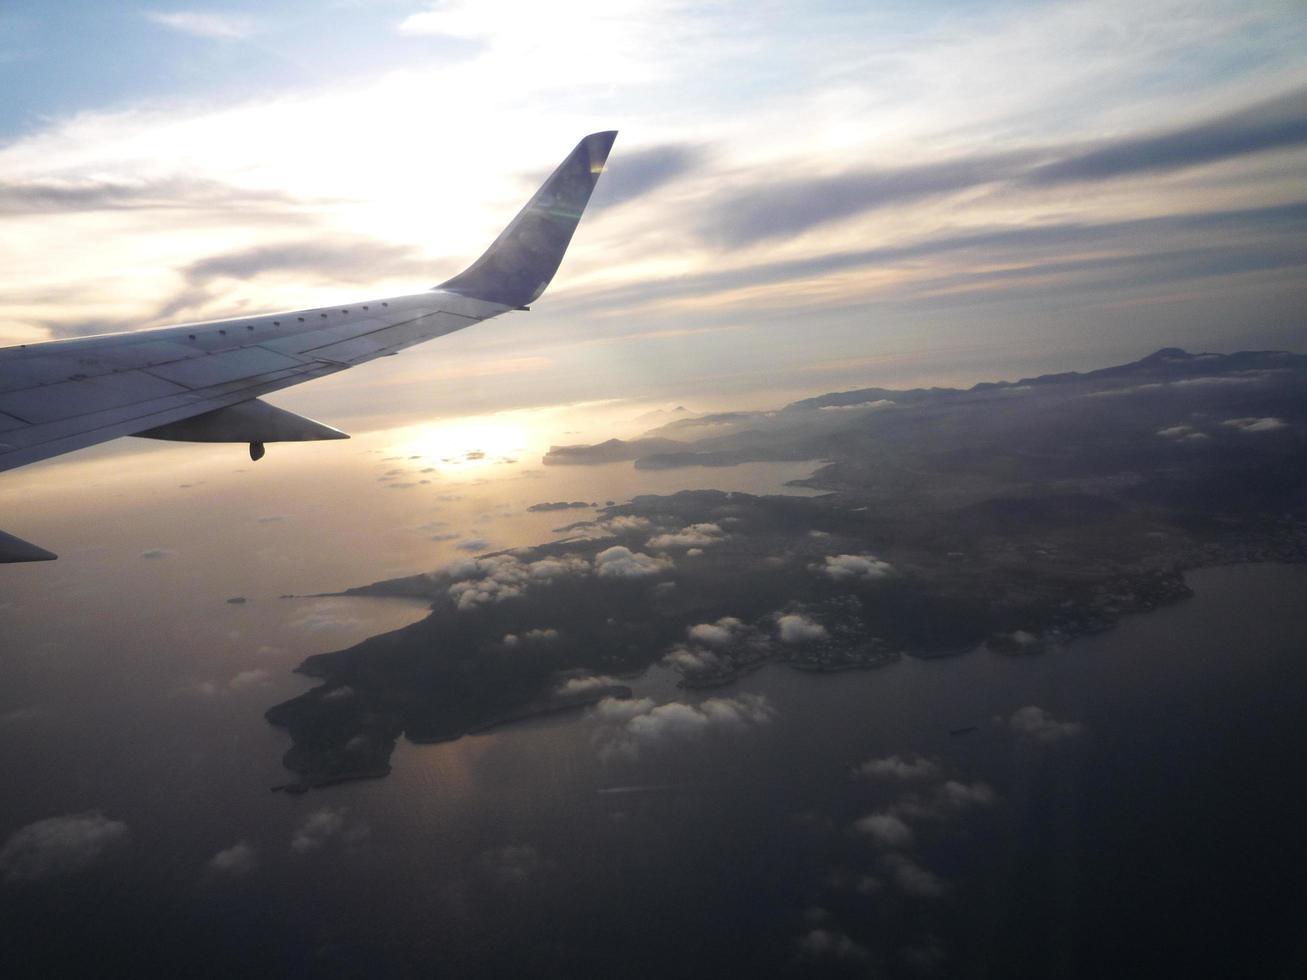 zonsopgang en vliegtuigvleugel uitzicht vanaf illuminator. foto